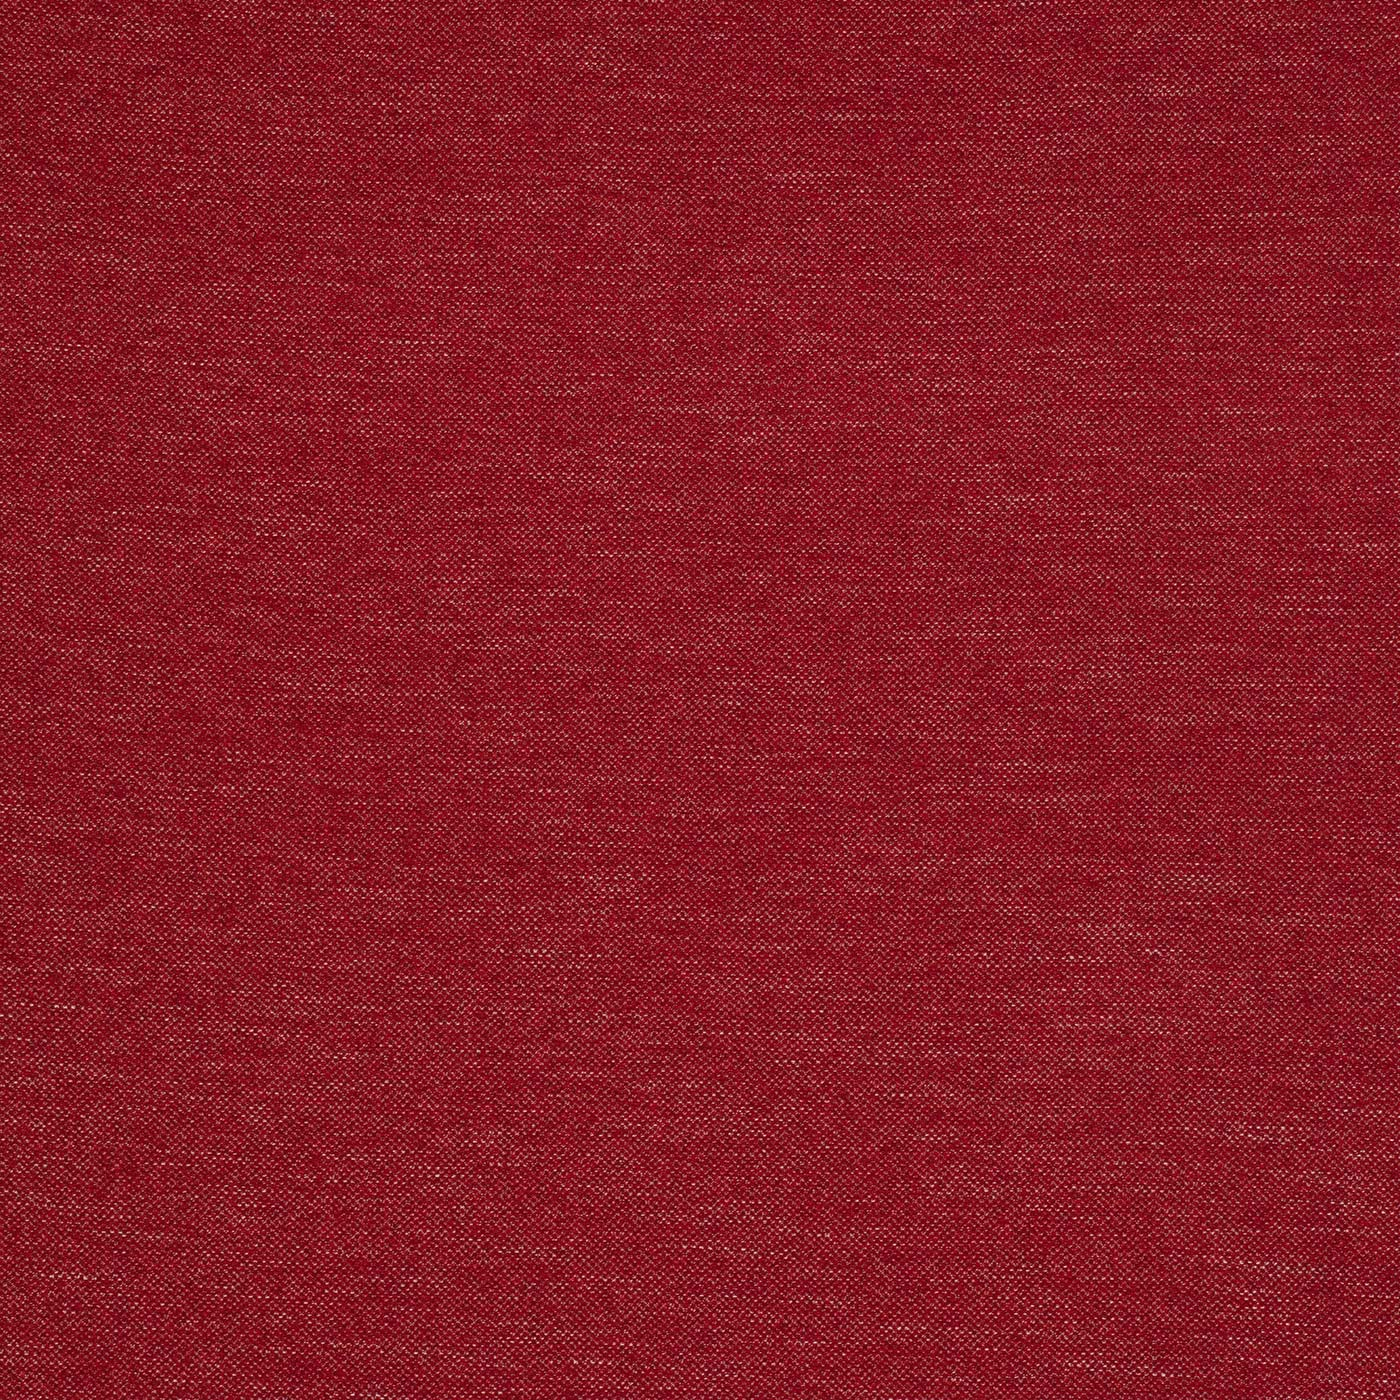 Sicily Red